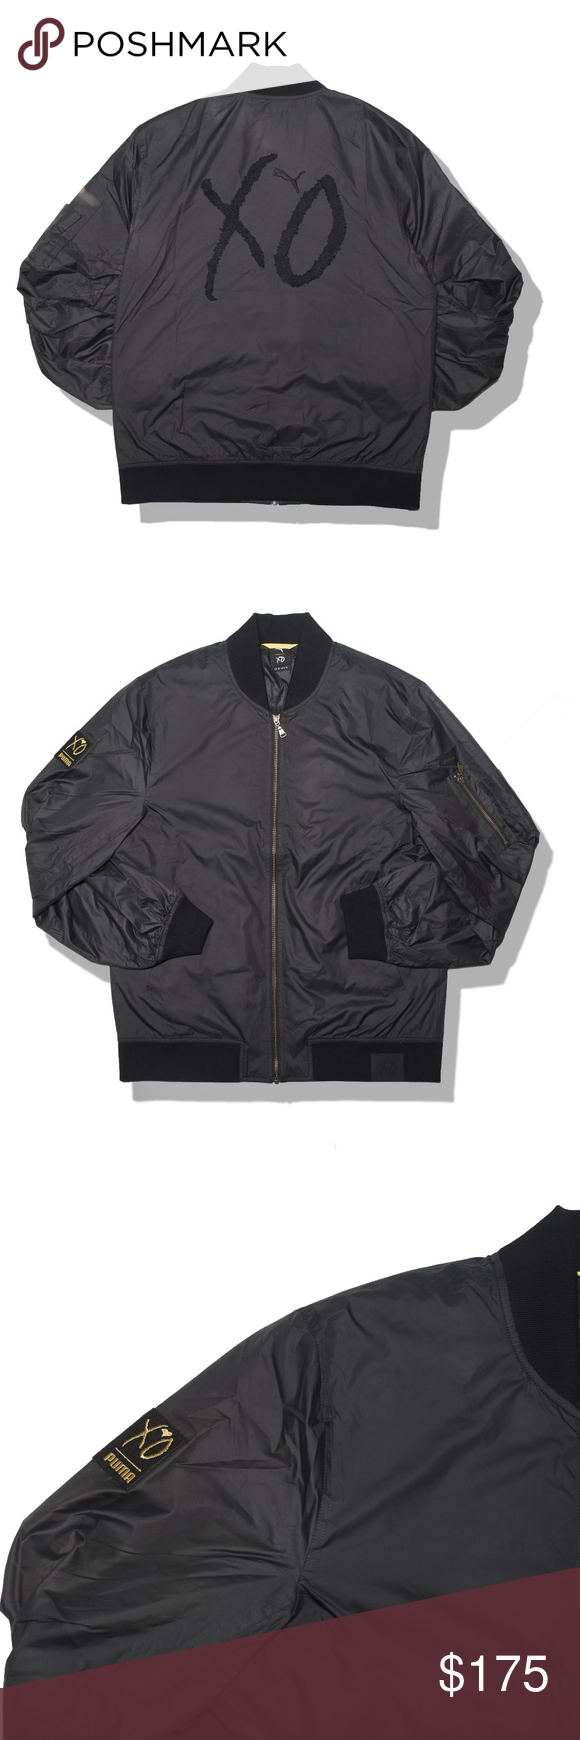 Men S Puma X Xo The Weeknd Bomber Jacket Fashion Clothes Design Fashion Design [ 1740 x 580 Pixel ]